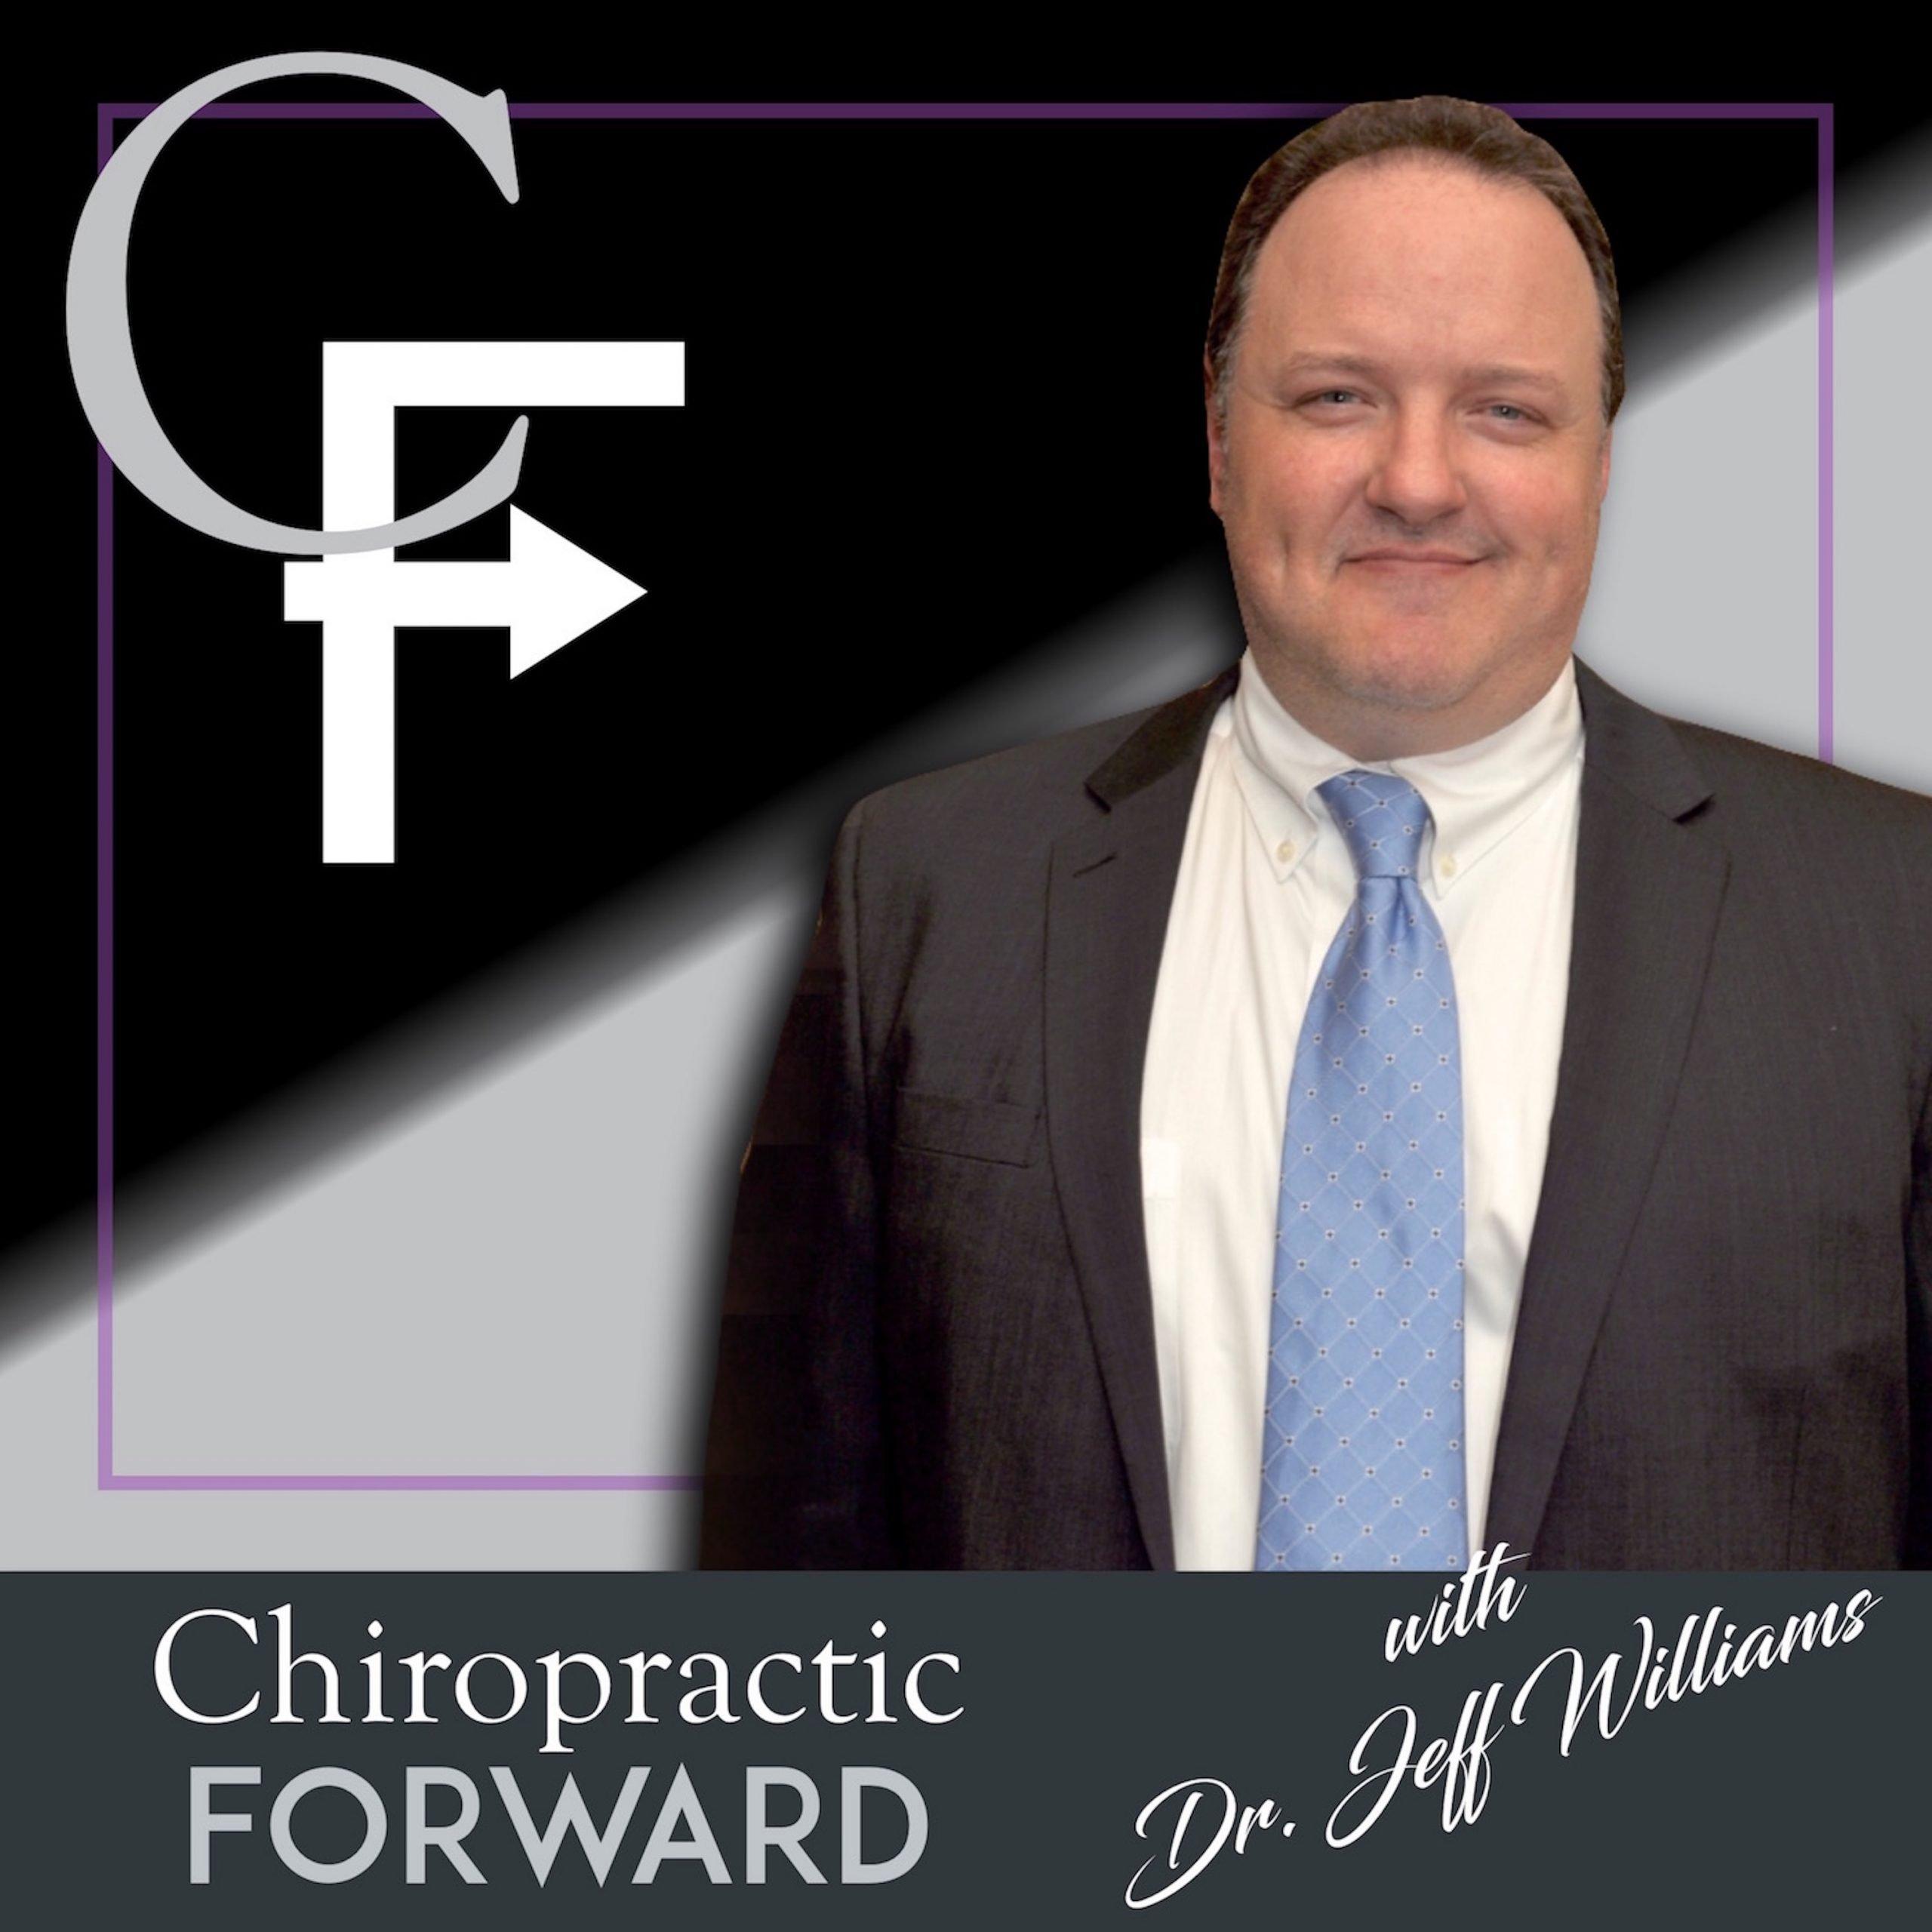 Jeff Williams - evidence-based chiropractor